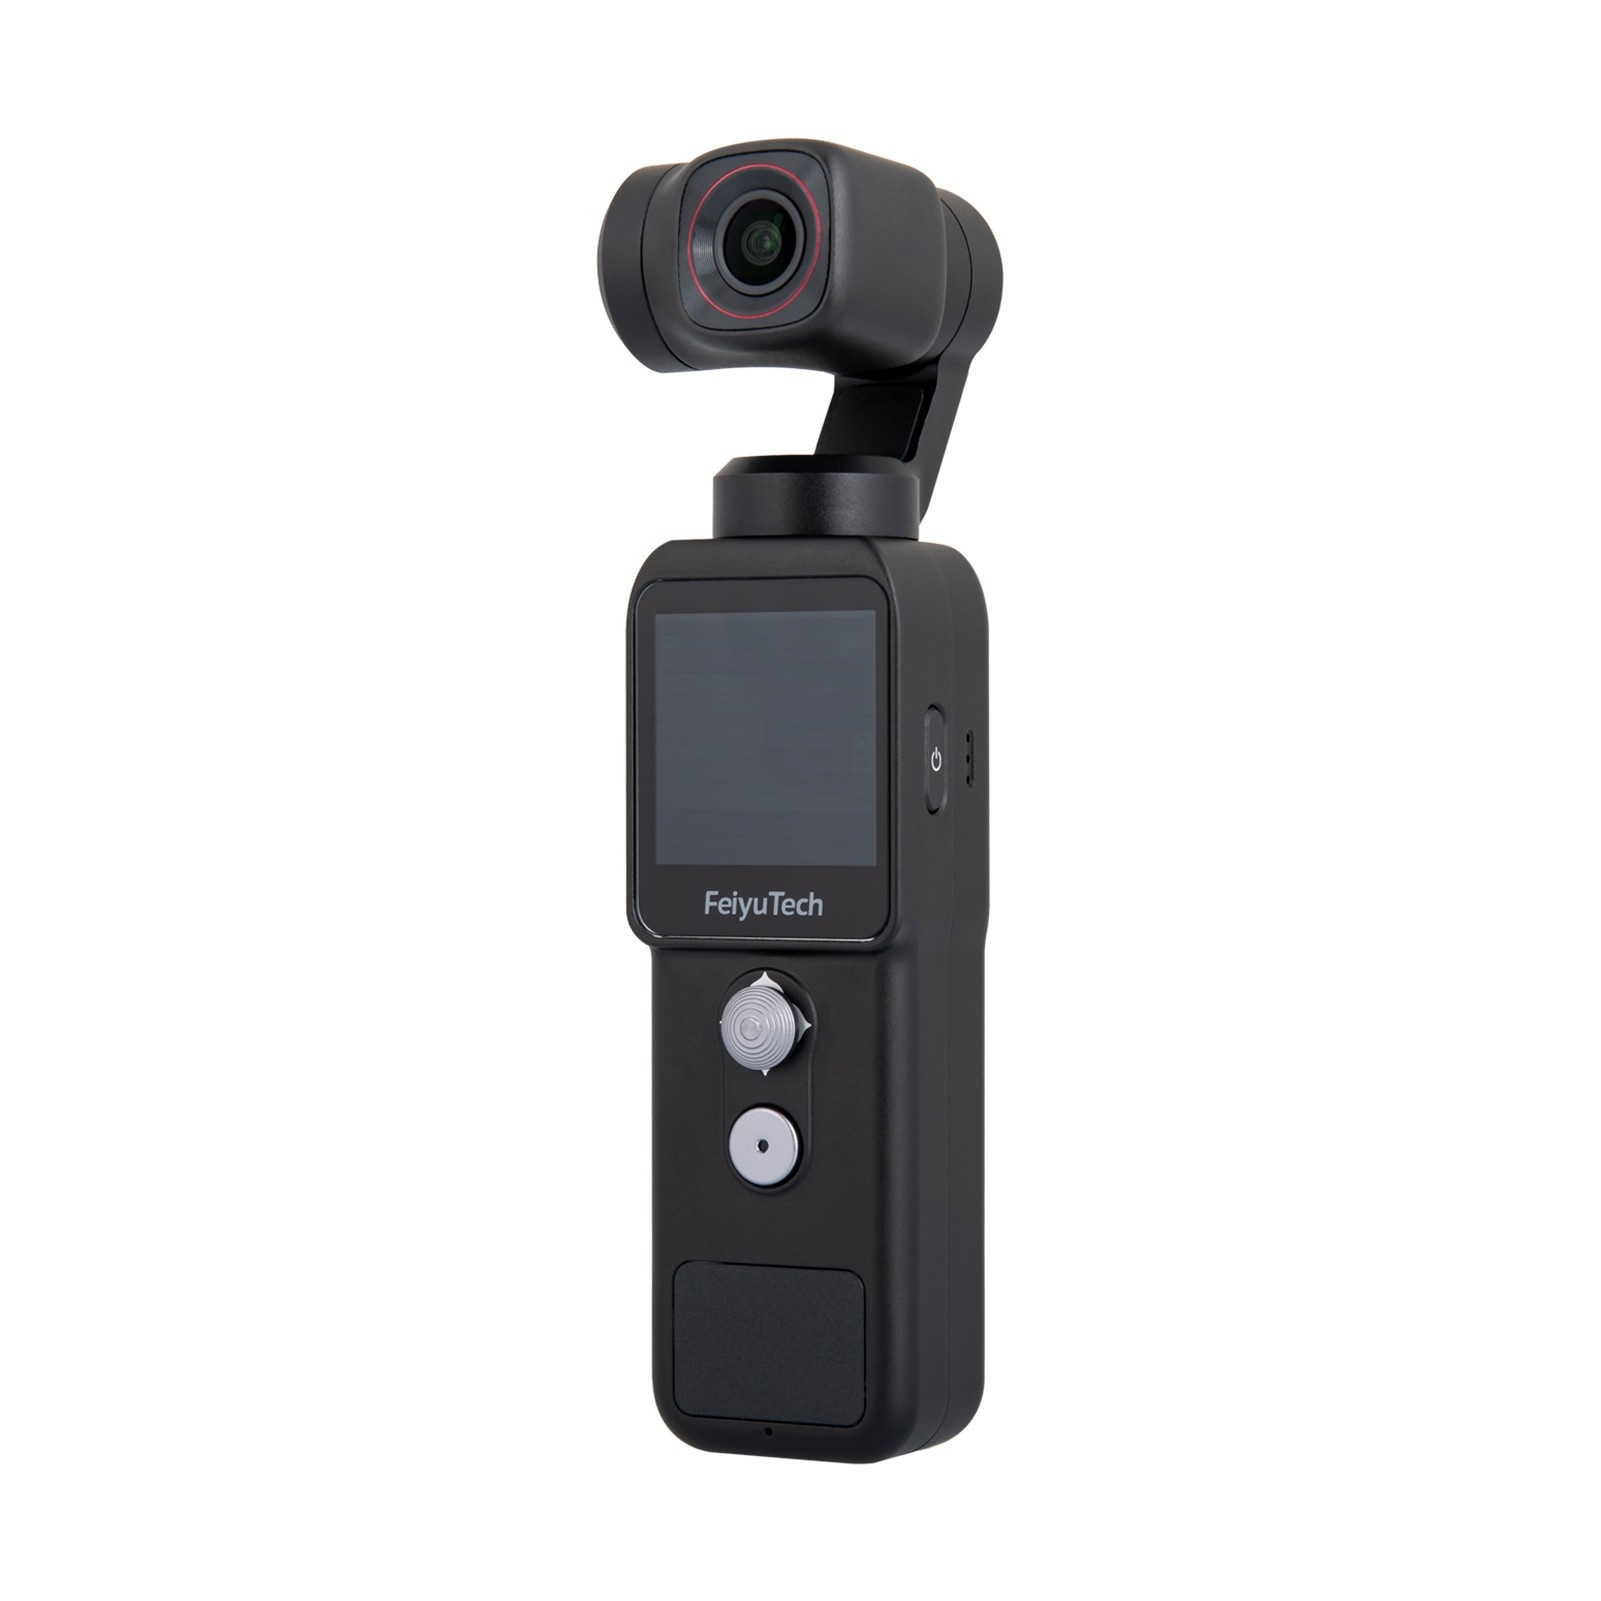 cafago.com - 24% OFF Feiyu Pocket 2 Handheld Stabilized Camera 3-Axis Gimbal,free shipping+$364.96